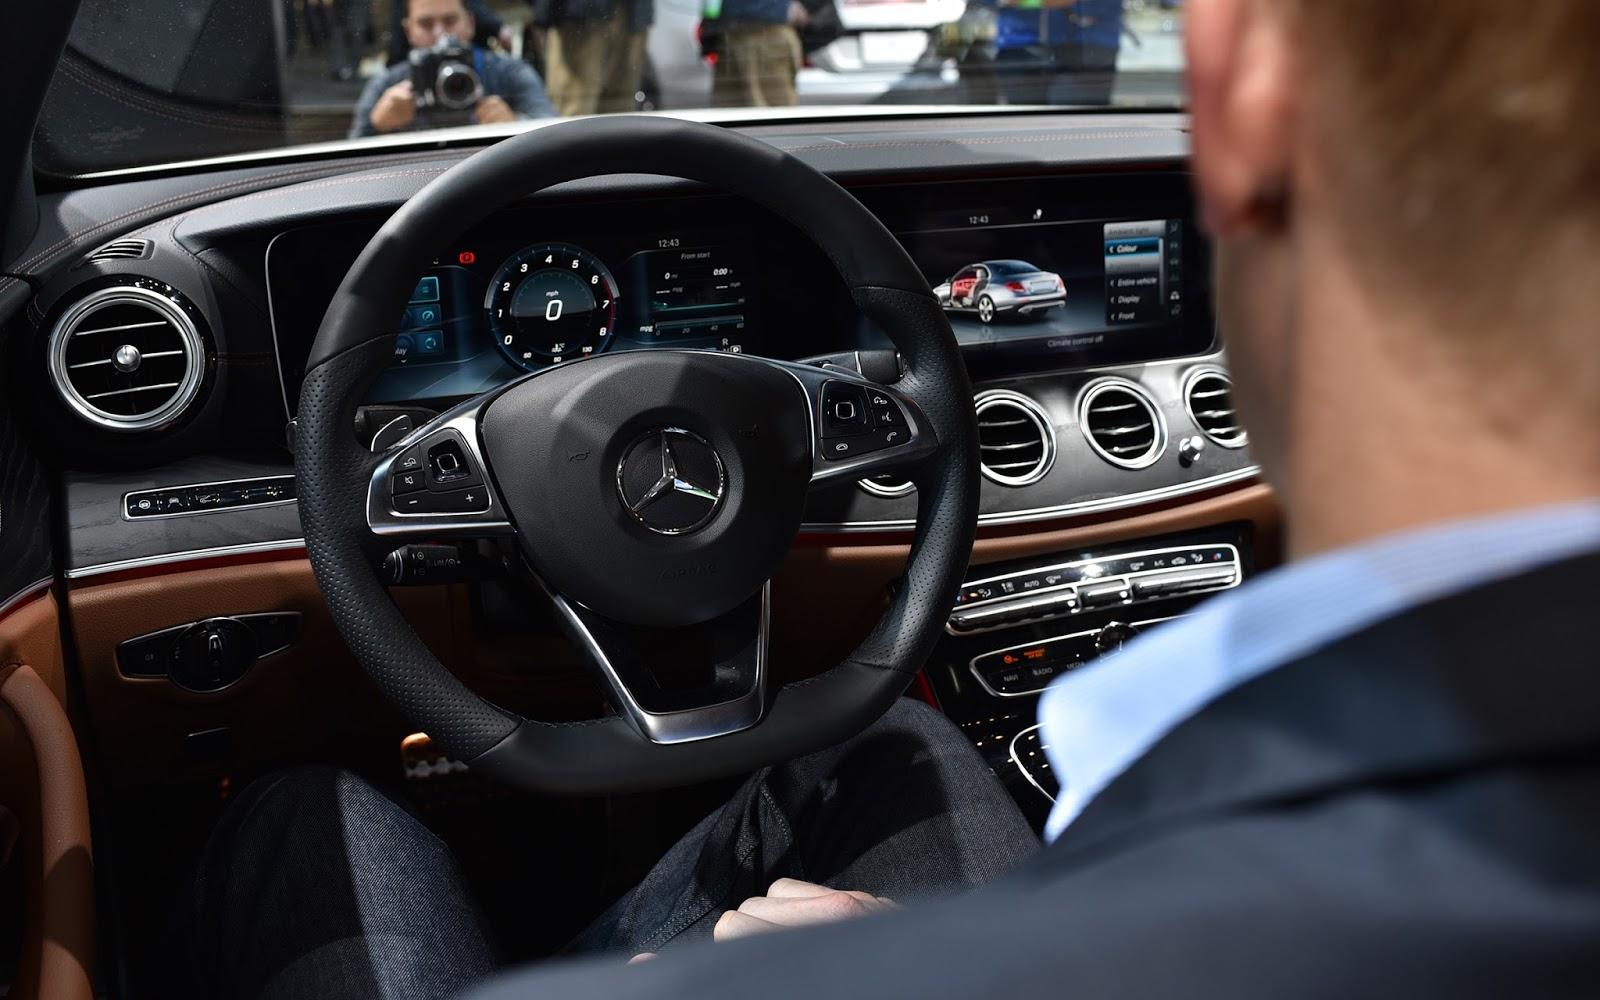 Naias 2016 darauf d rfen wir europ er uns freuen for Mercedes e interieur